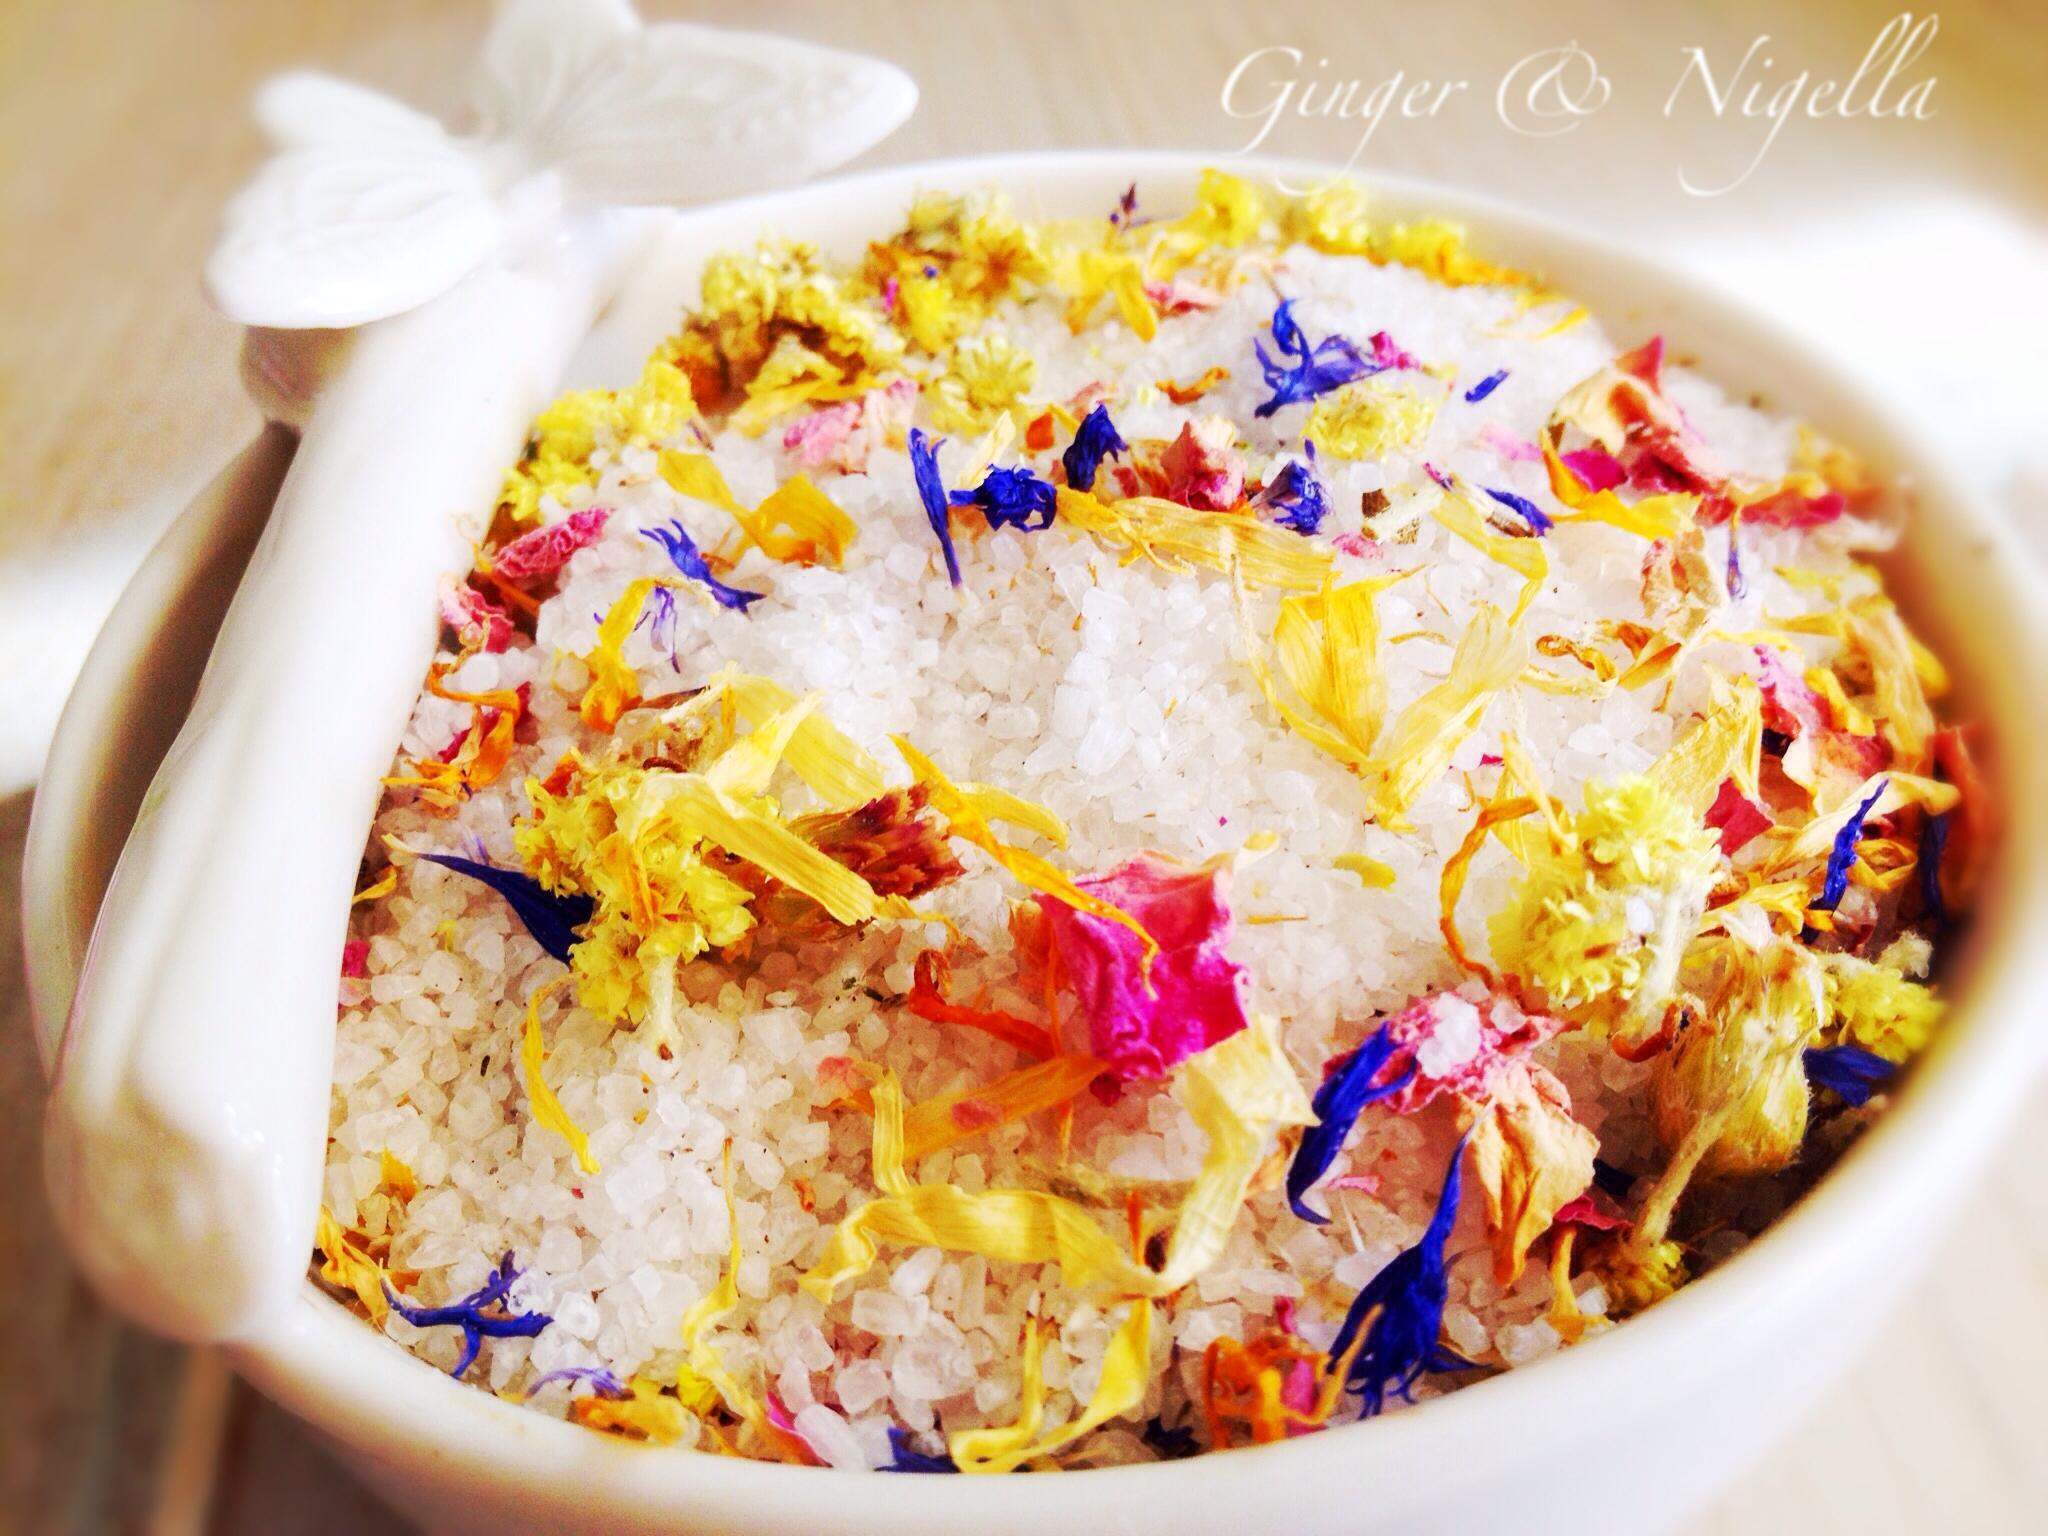 Margherita ginger nigella for Fiori edibili